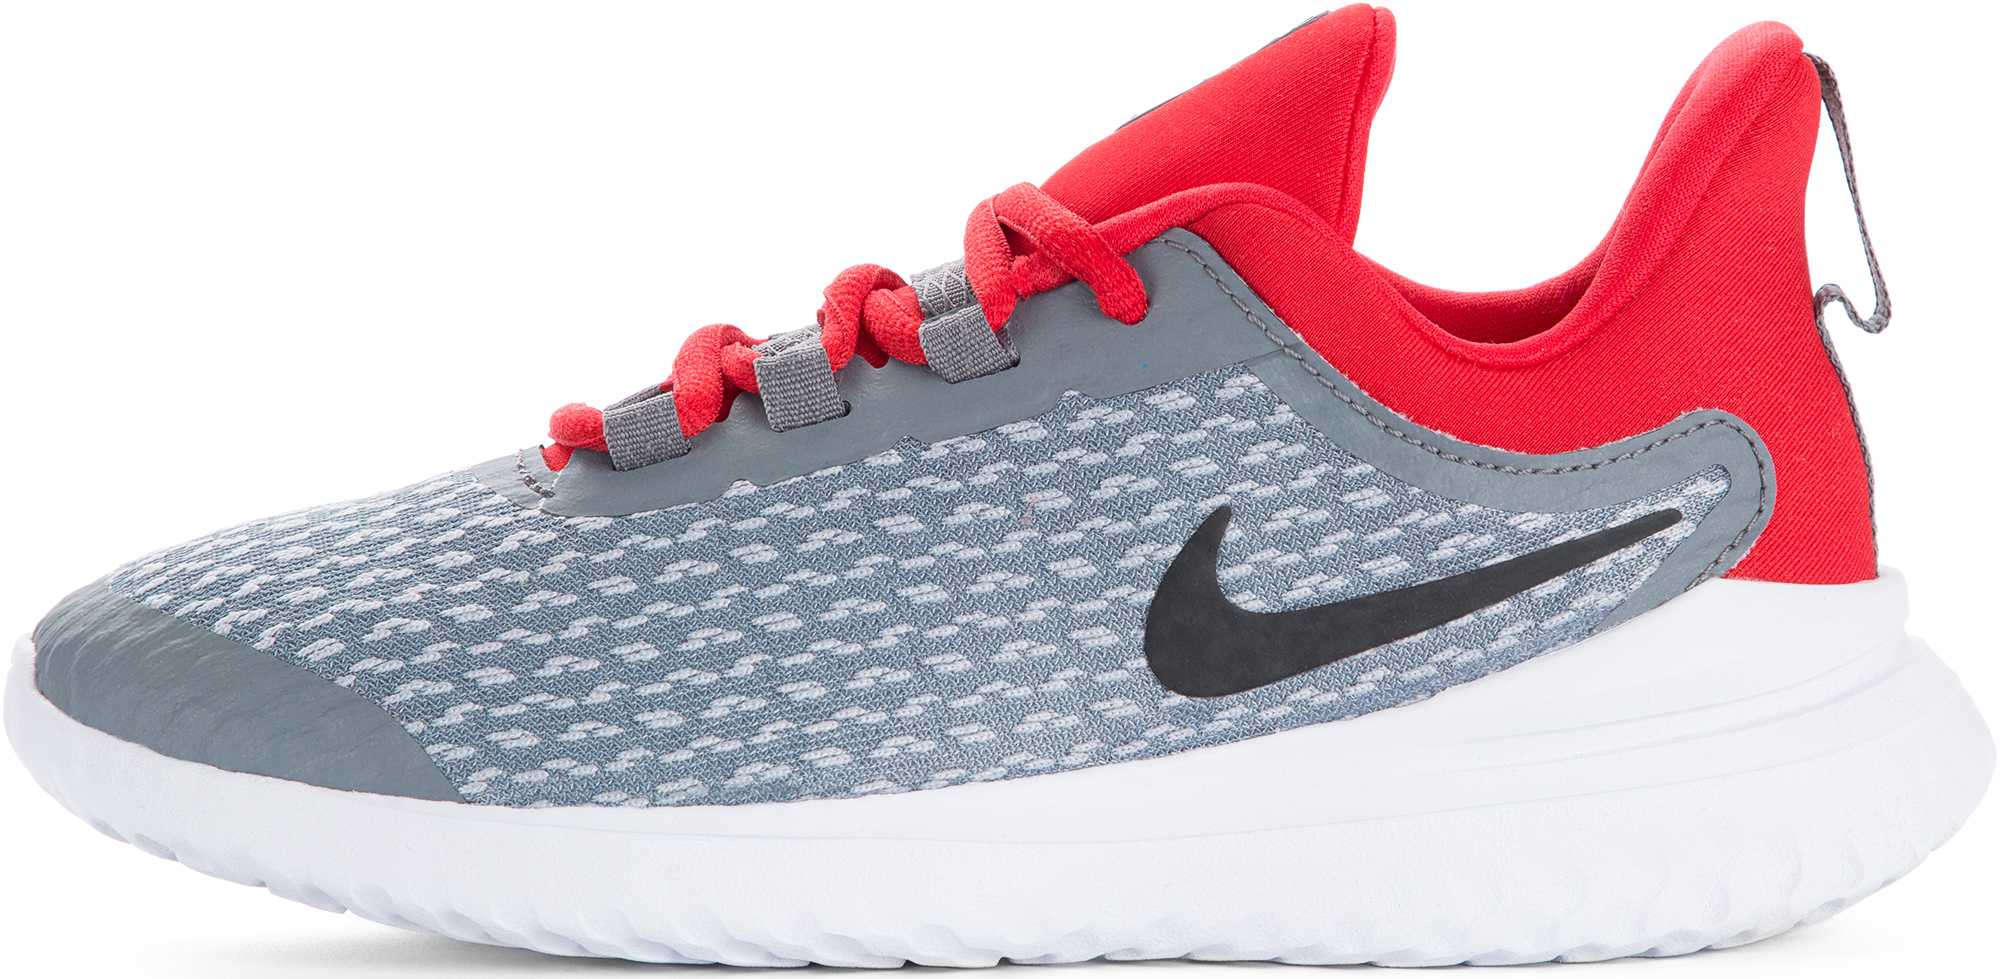 Nike Кроссовки для мальчиков Nike Rival, размер 34